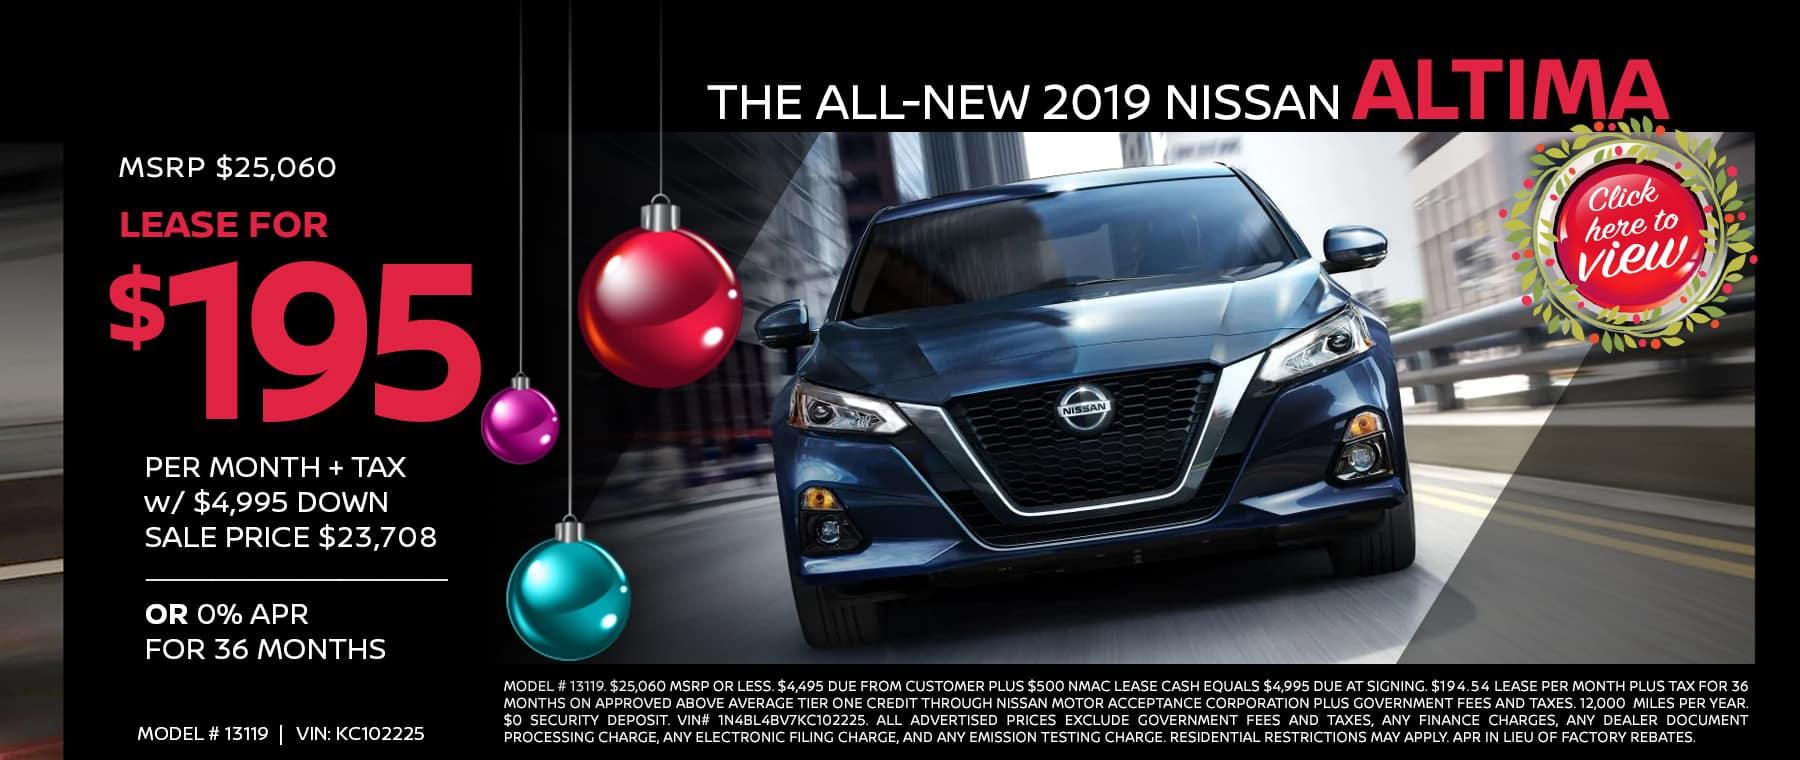 Nissan Altima 2019 specials